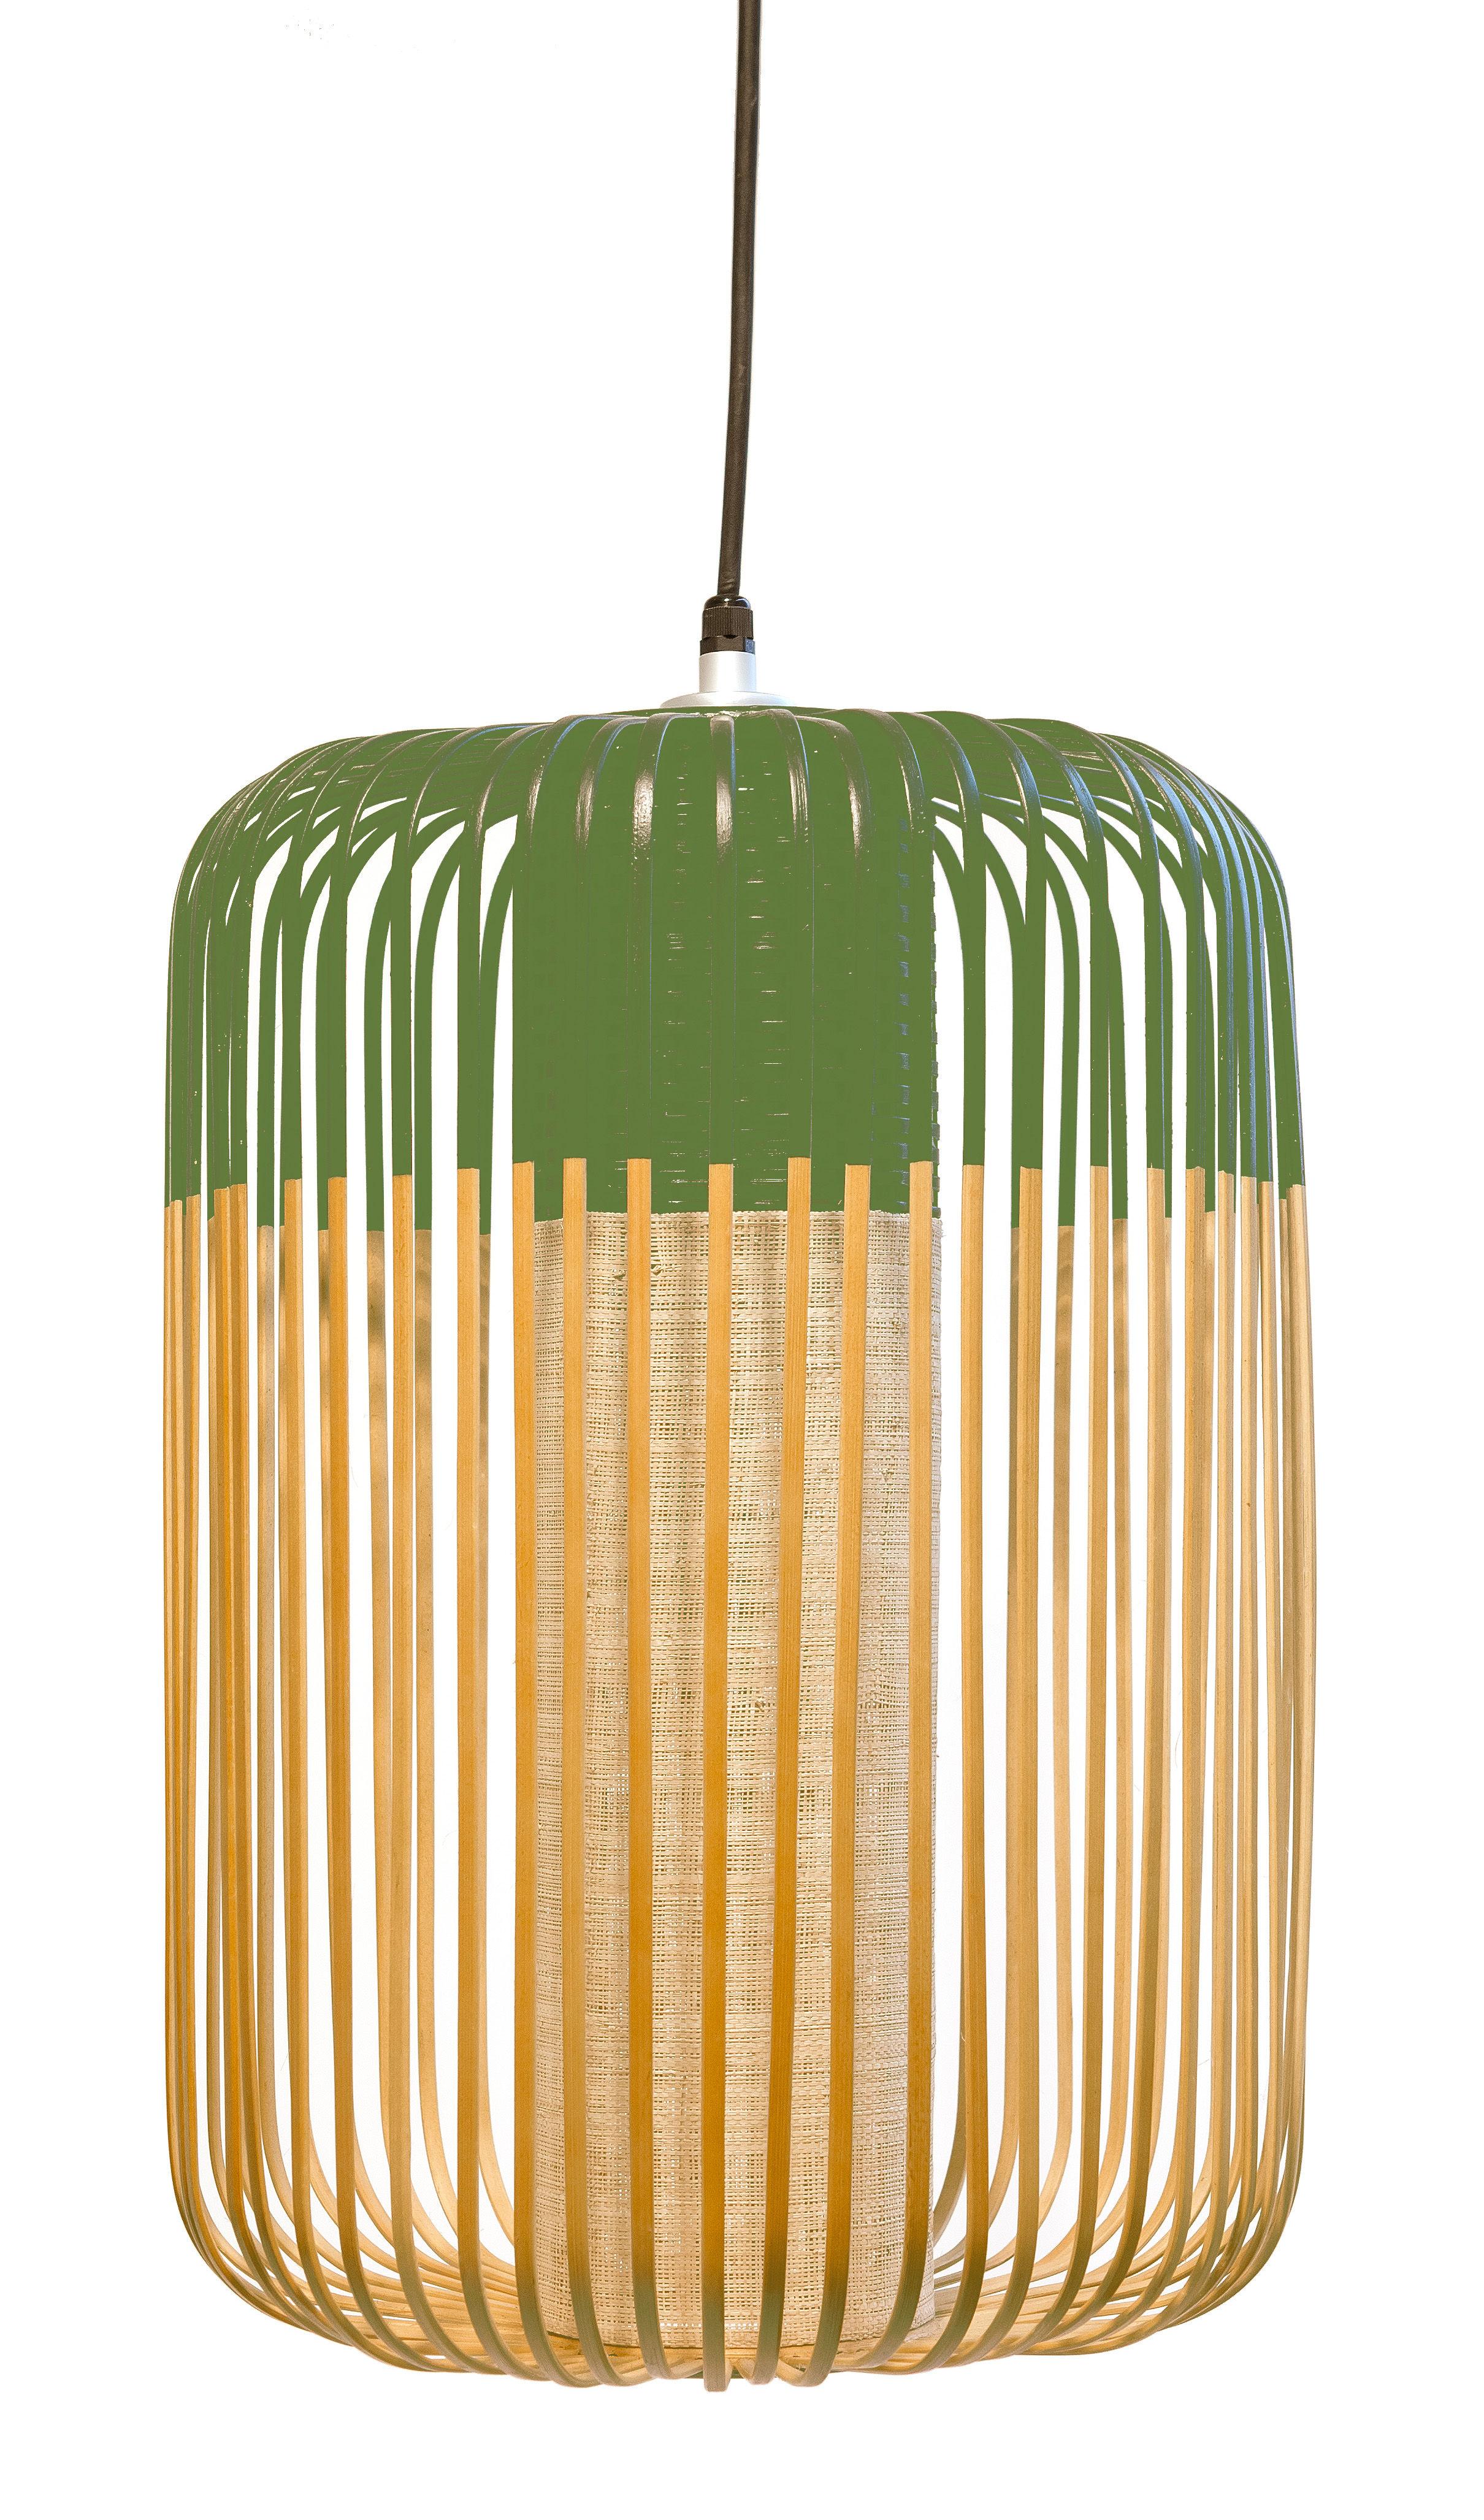 Lighting - Pendant Lighting - Bamboo Light L Pendant - H 50 x Ø 35 cm by Forestier - Green / Natural - Fabric, Metal, Natural bamboo